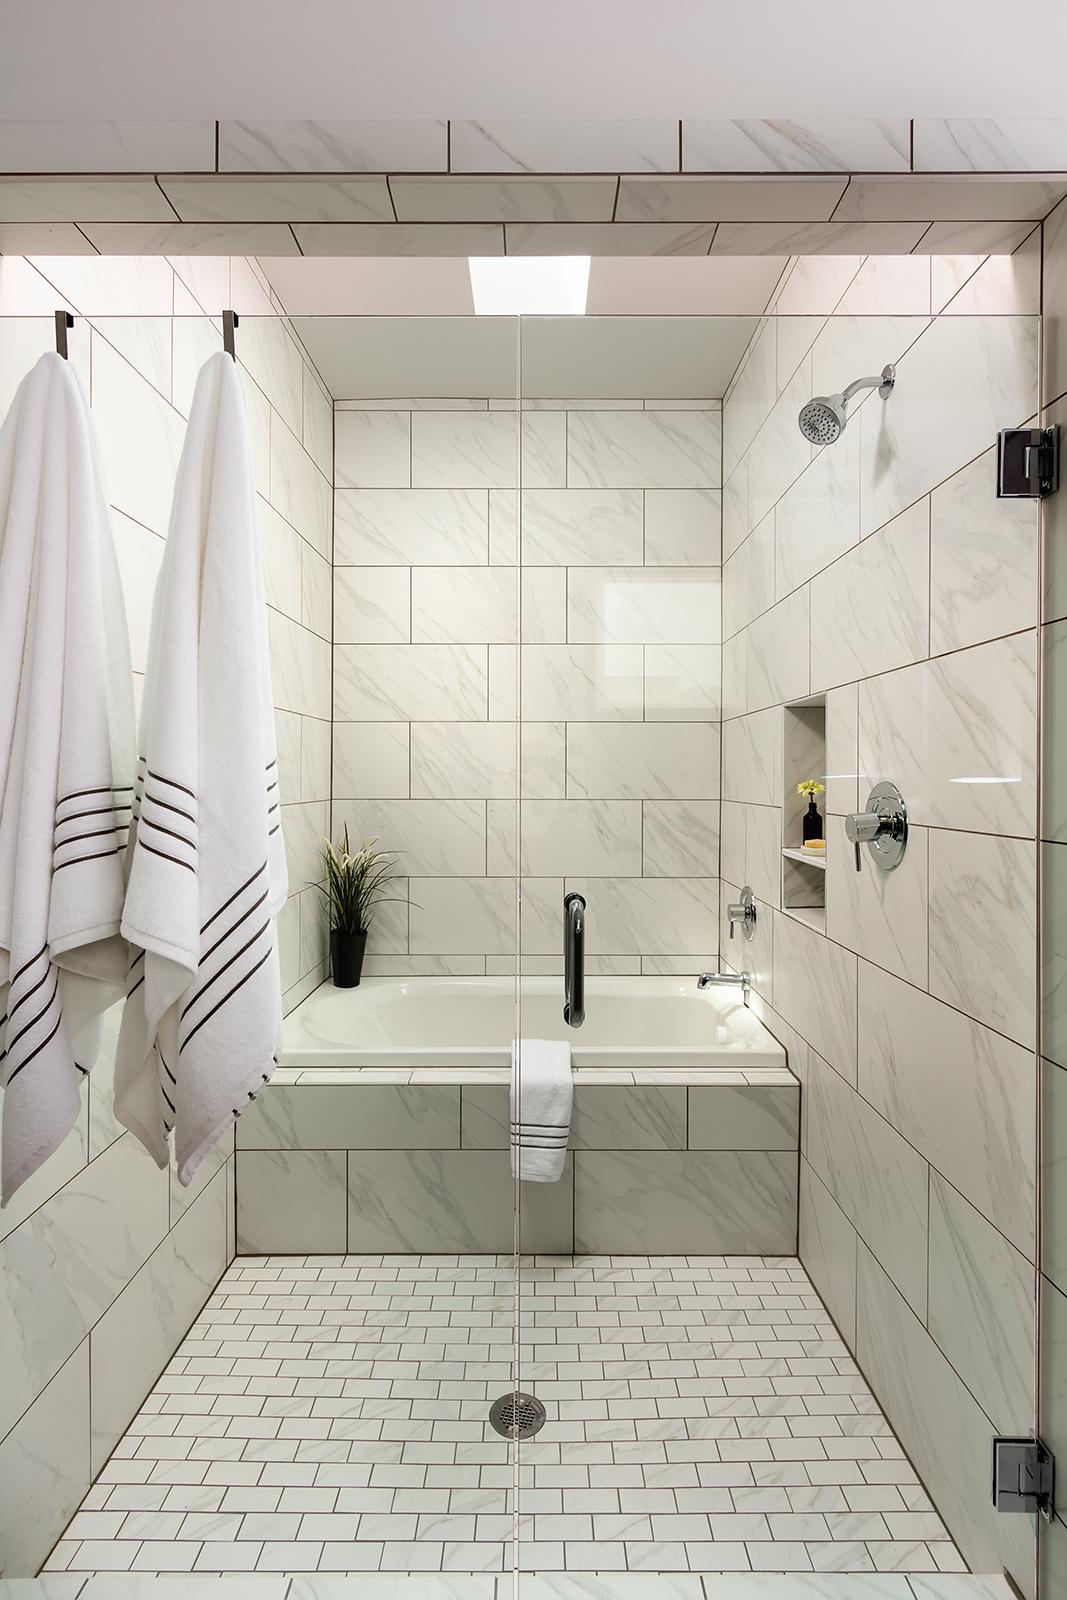 040 1307 Axis_Master Bathroom Shower.jpg